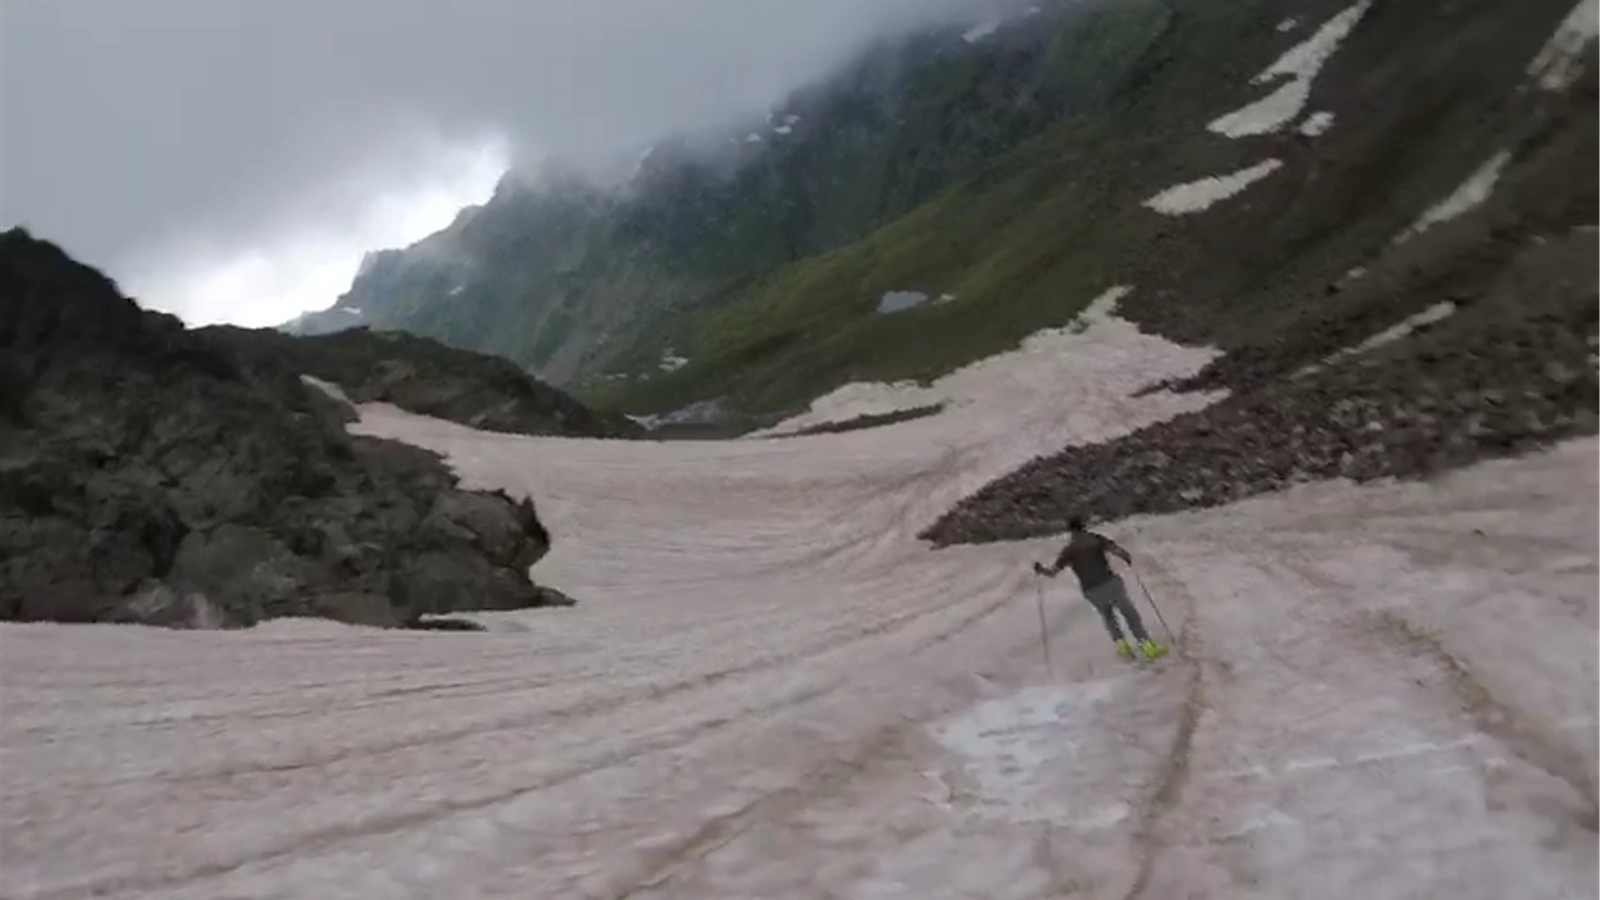 Què fem a l'estiu? Esquiar a Tristaina